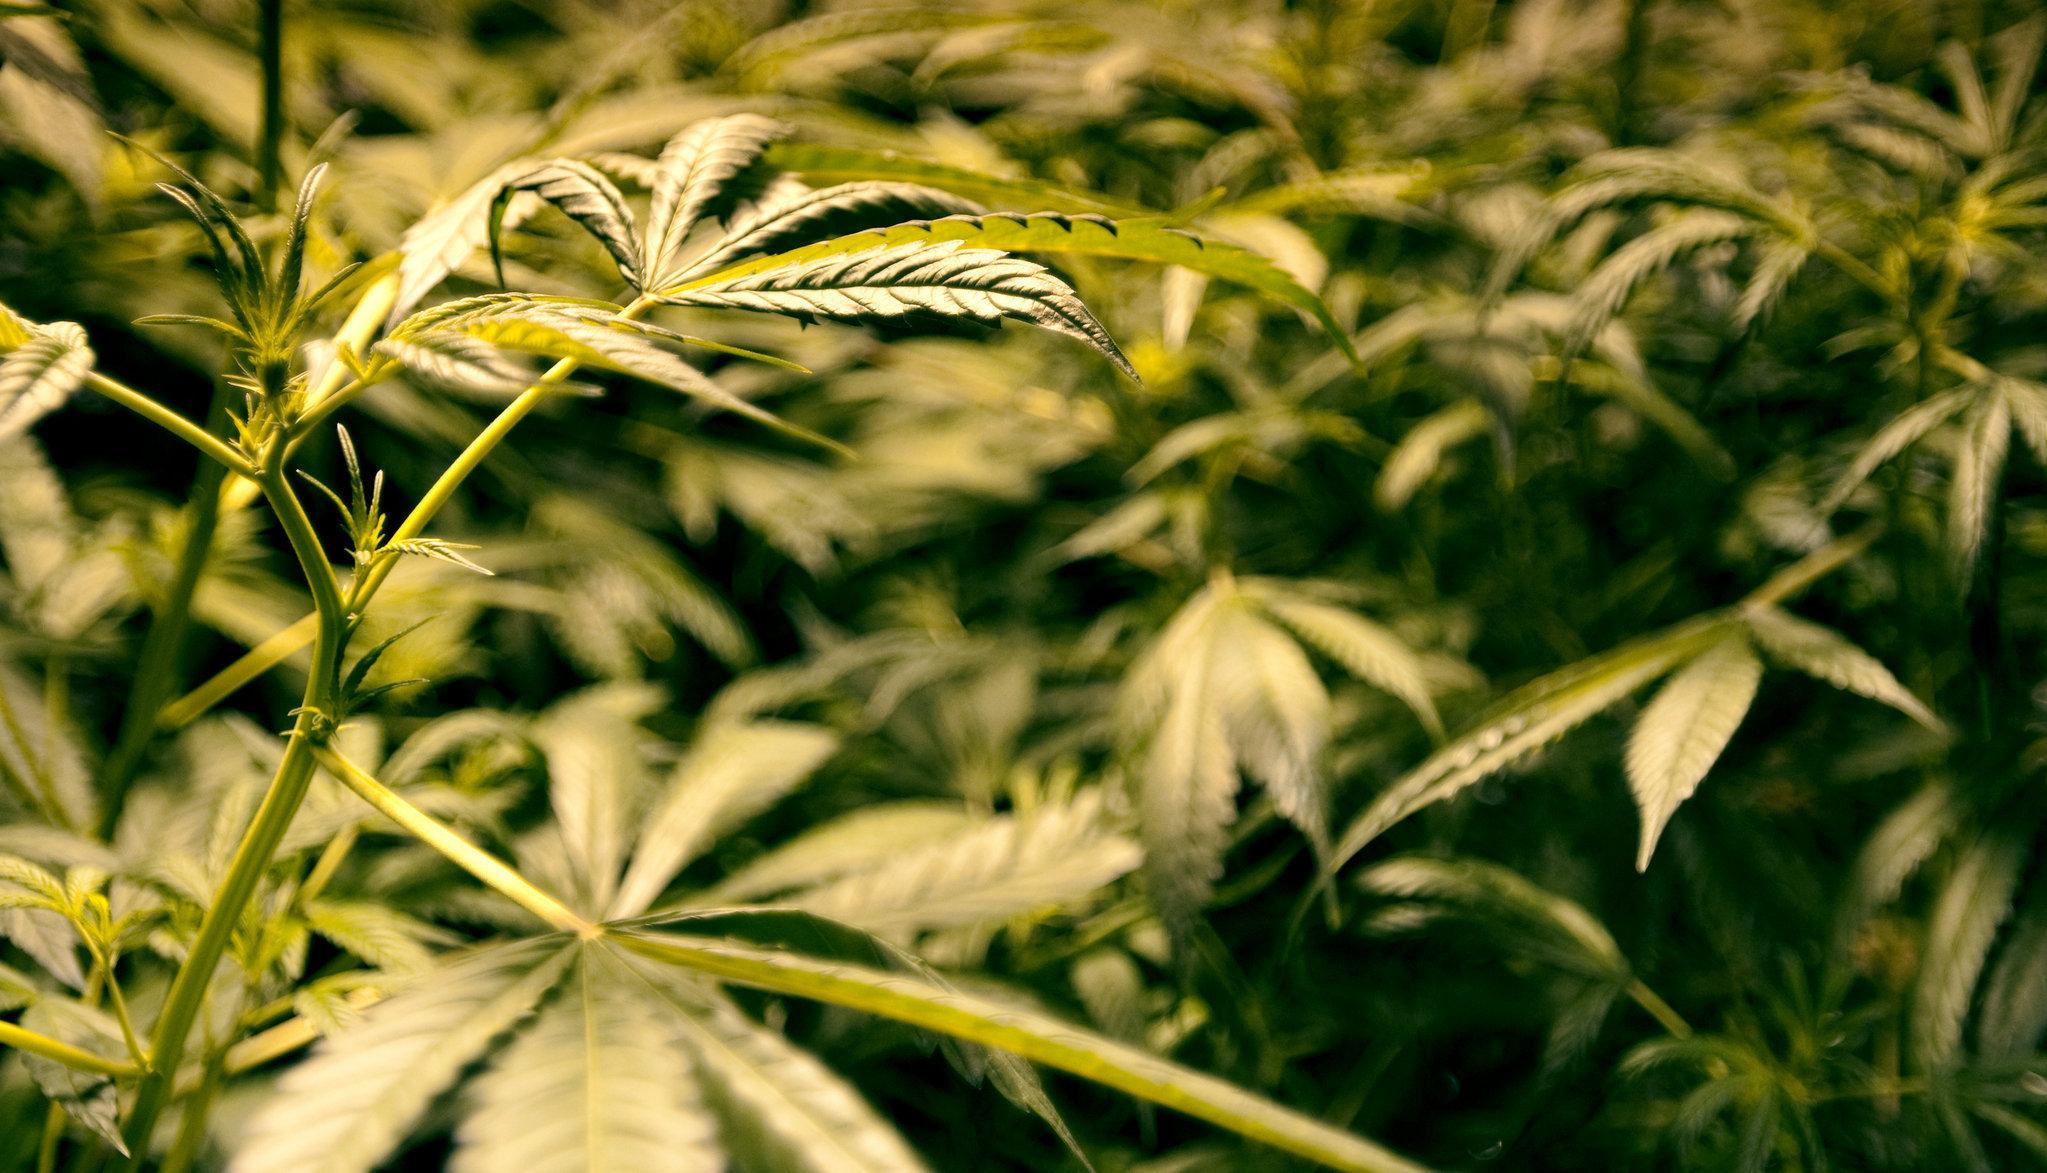 High Cannabidiol Low Thc Cannabis